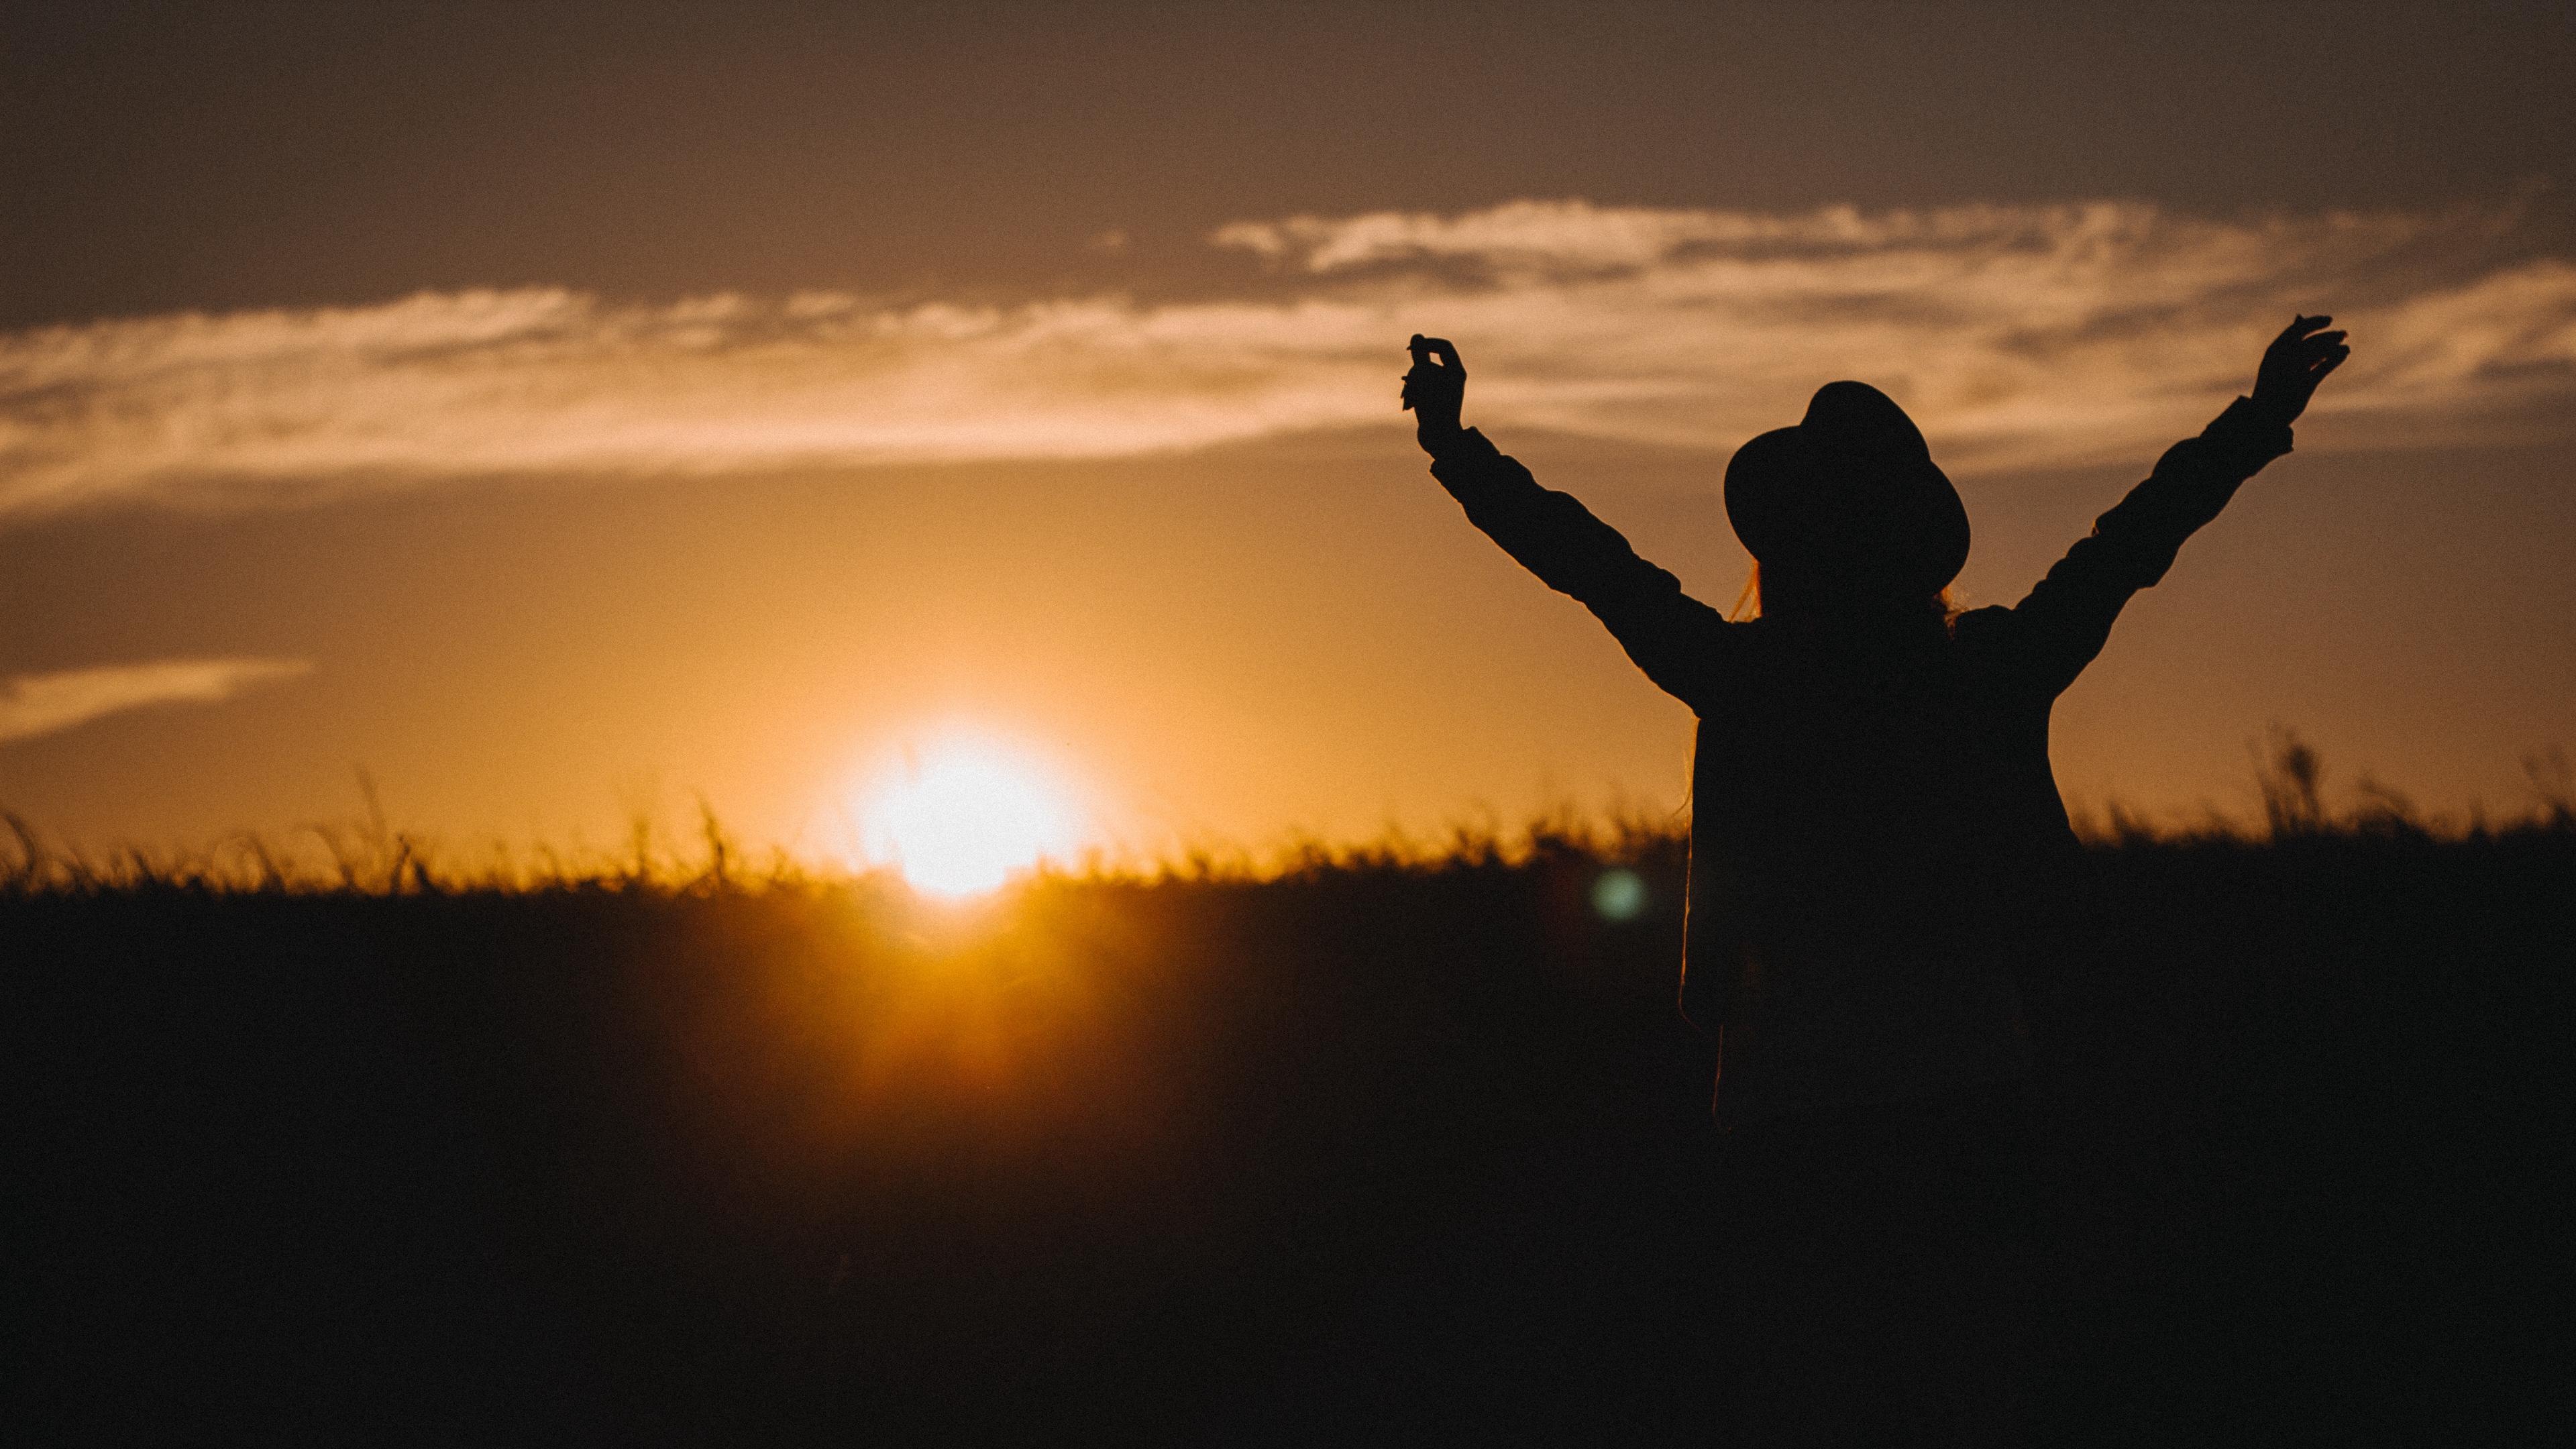 silhouette night sunset freedom 4k 1540574395 - silhouette, night, sunset, freedom 4k - sunset, Silhouette, Night